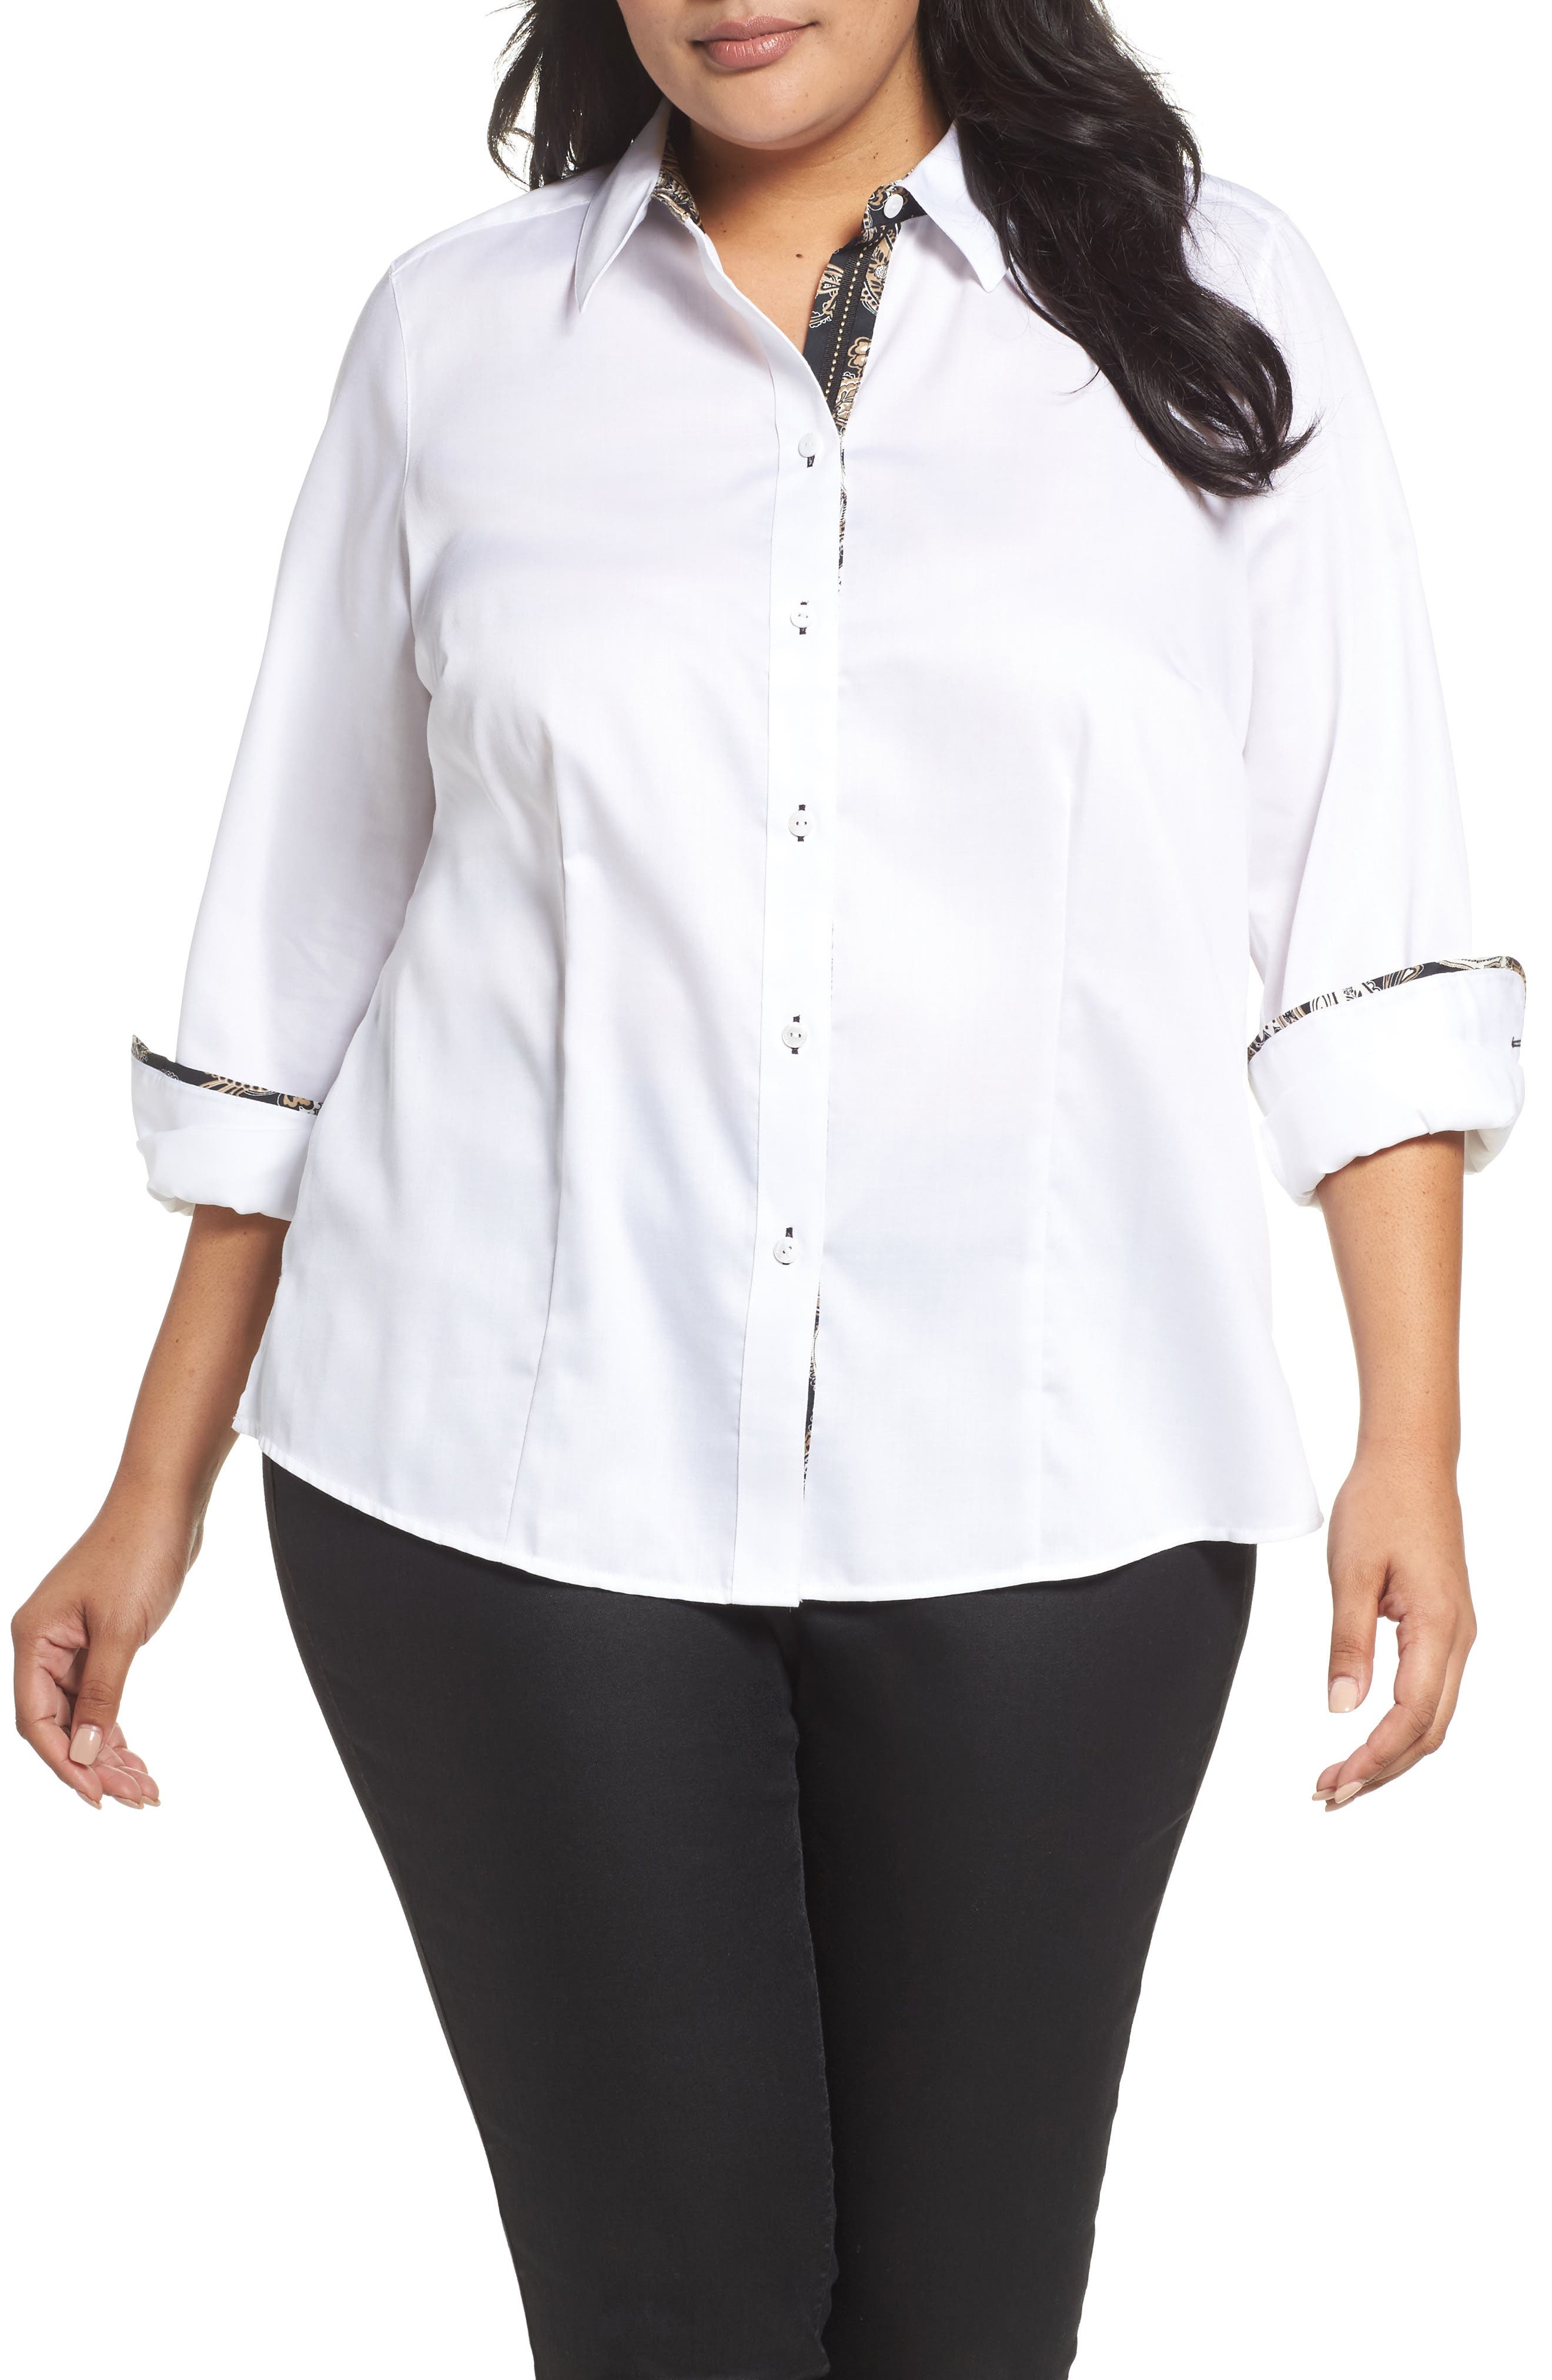 Foxcroft Brooke Contrast Trim Sateen Shirt (Plus Size)